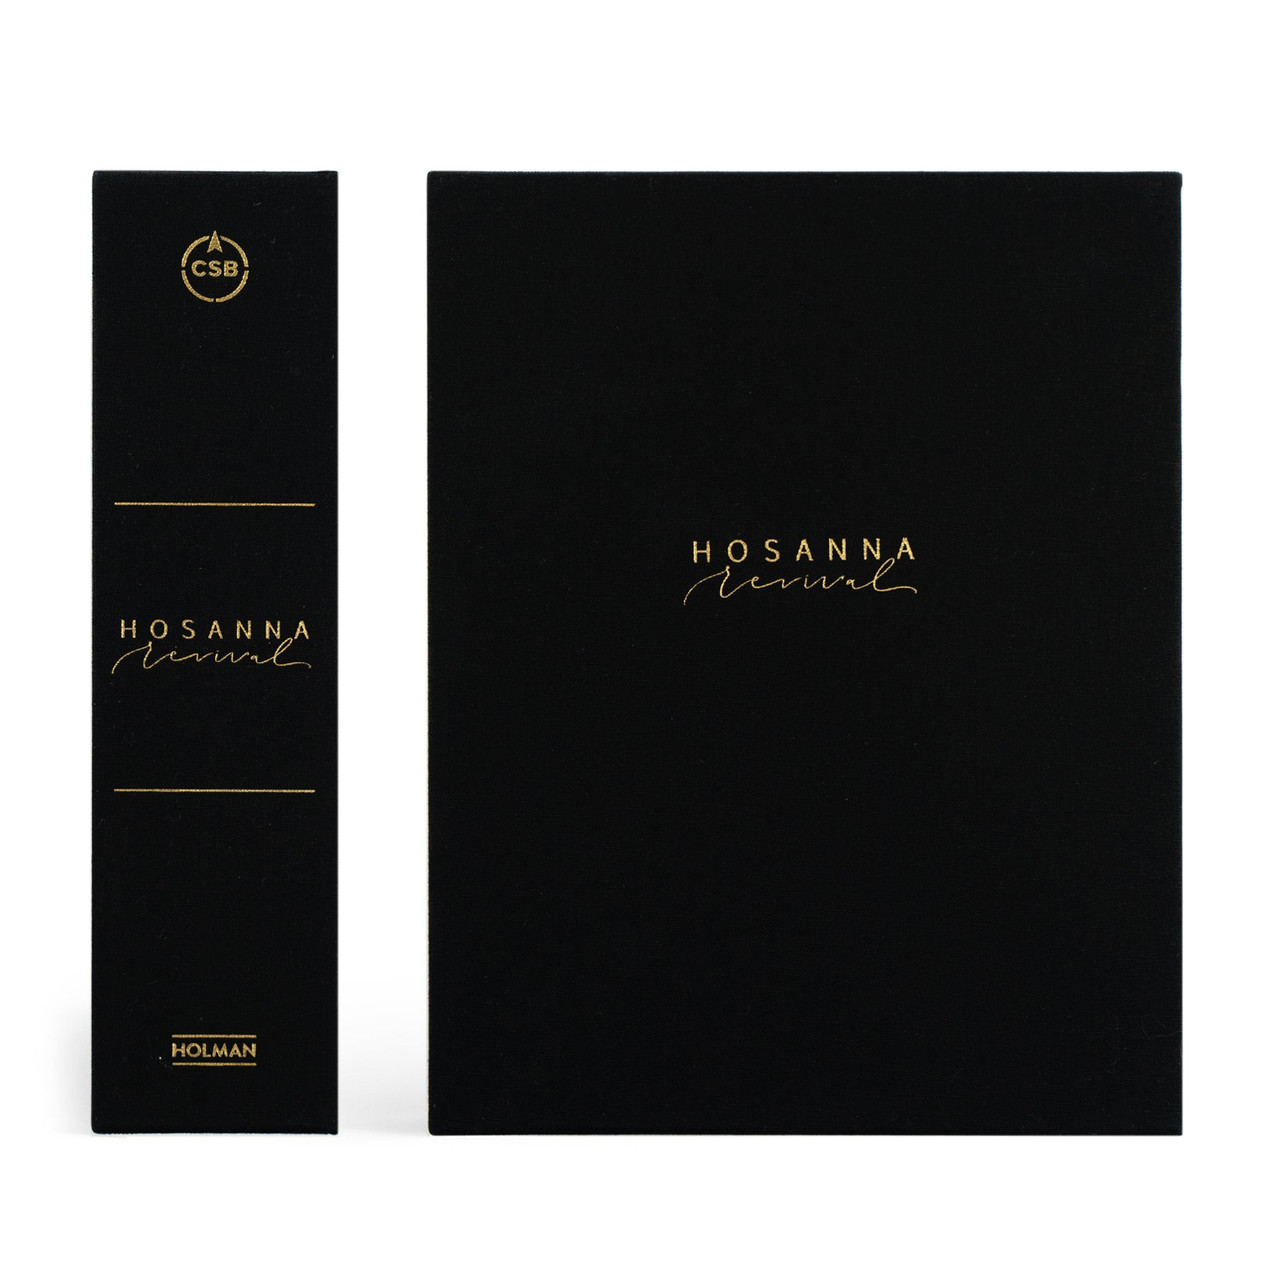 Hosanna Revival Bible - Brooklyn Theme - CSB Notetaking Bible